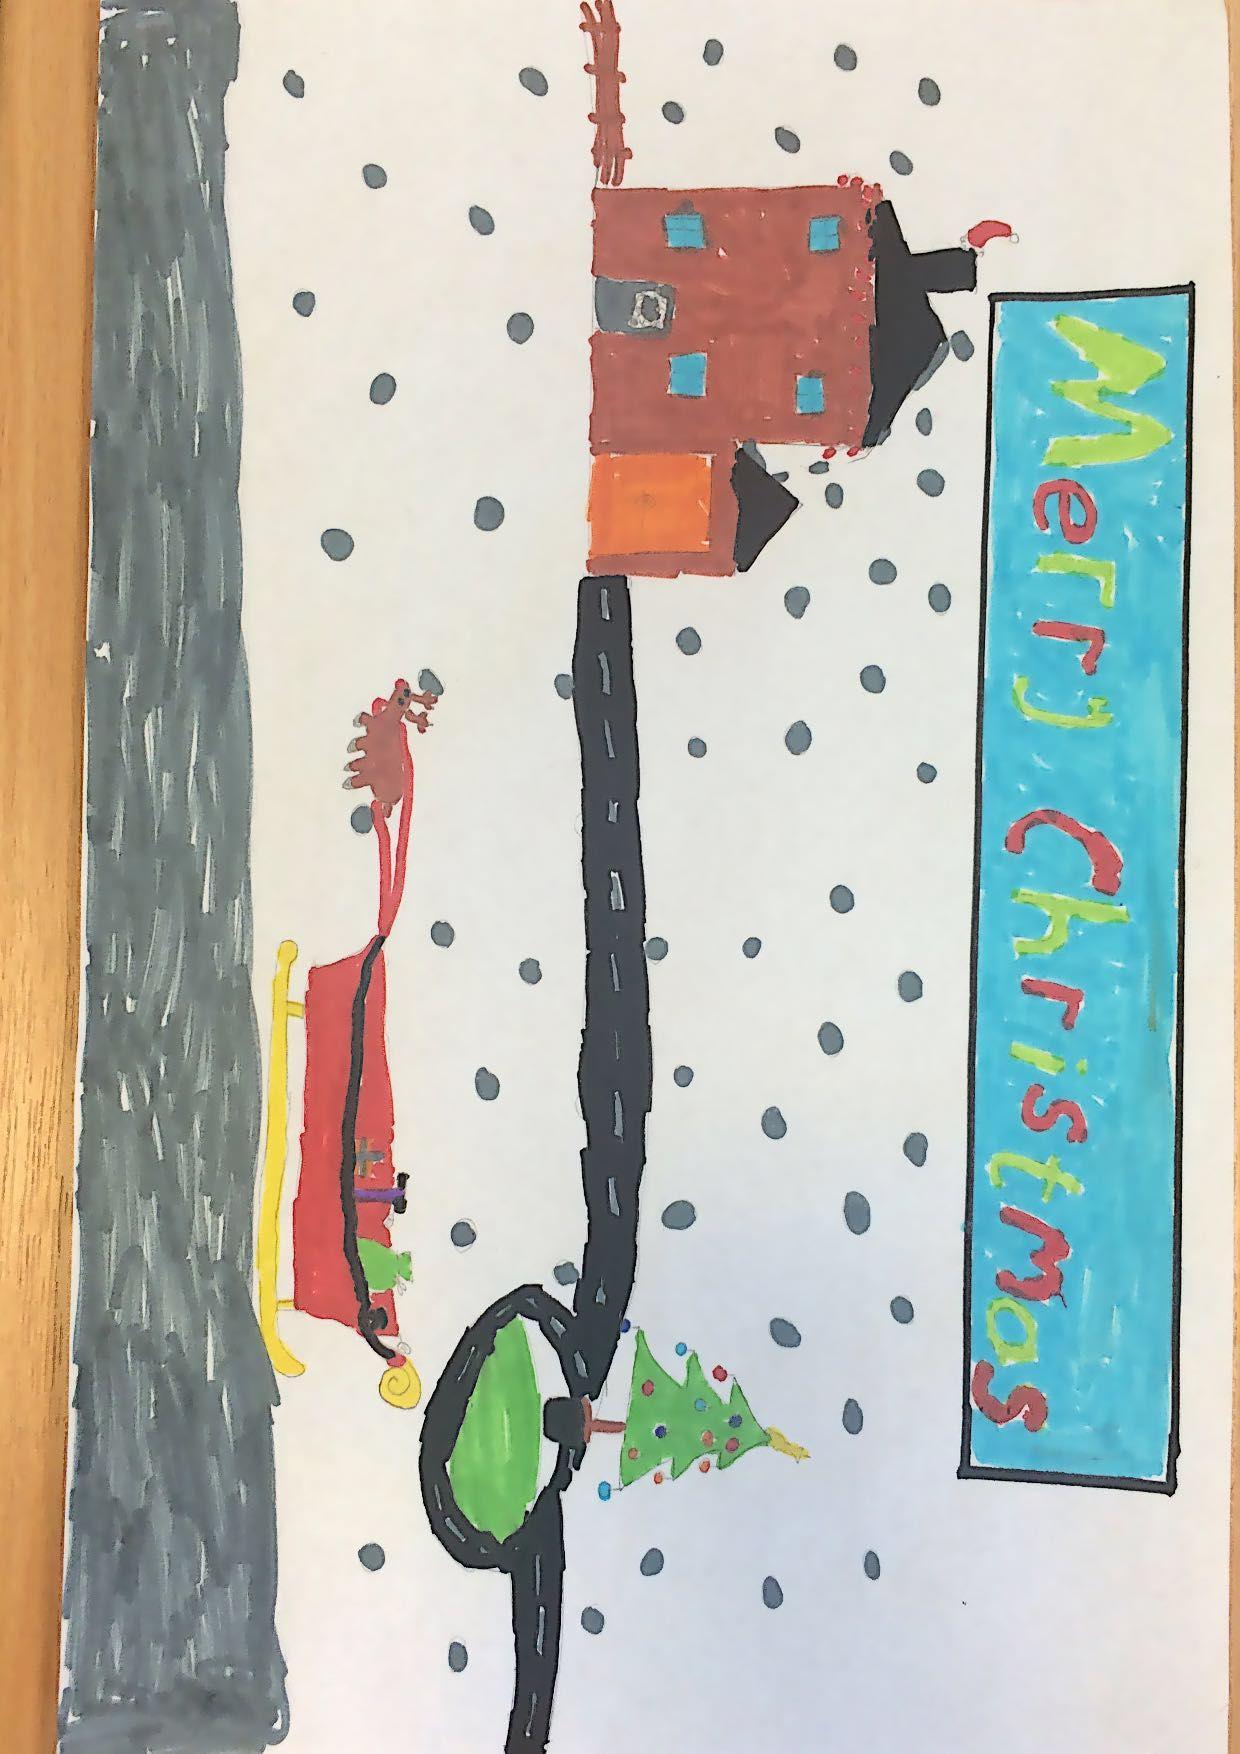 Lucy Rowan Year 5 St Columba S Rcva Primary School Christmas